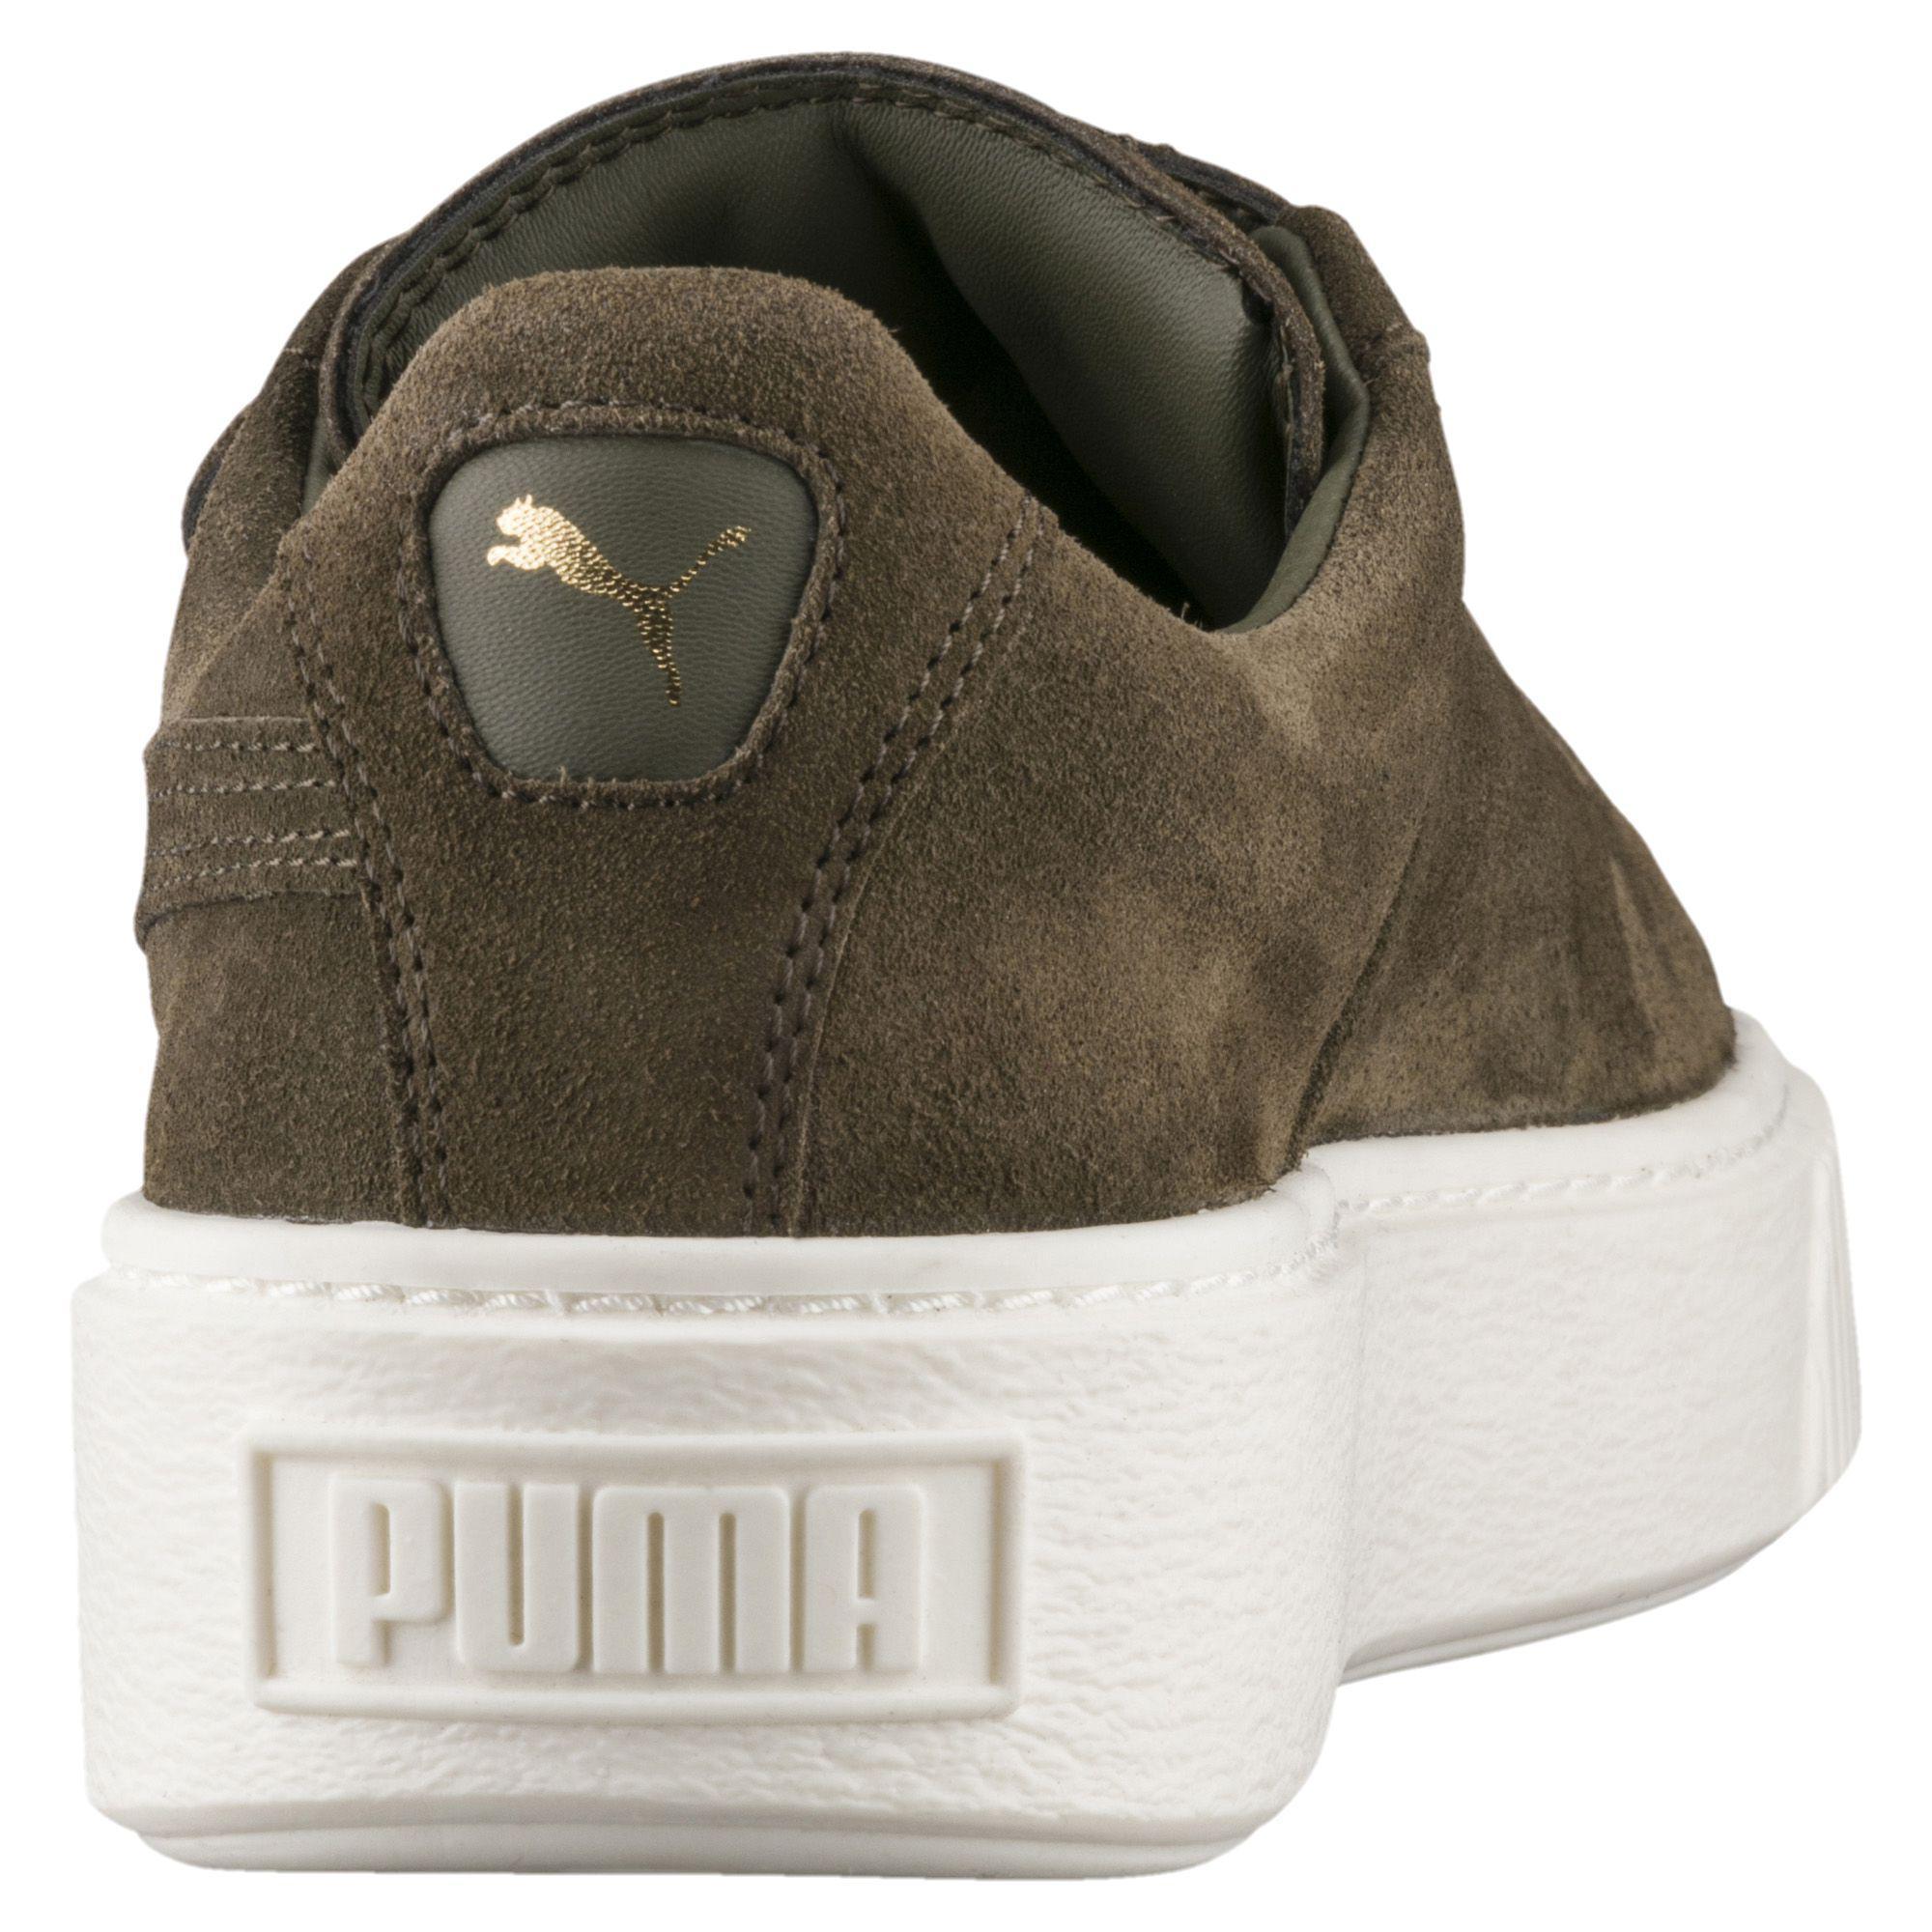 4eeb03761e35 Lyst - PUMA Suede Platform Big Strap Women s Sneakers